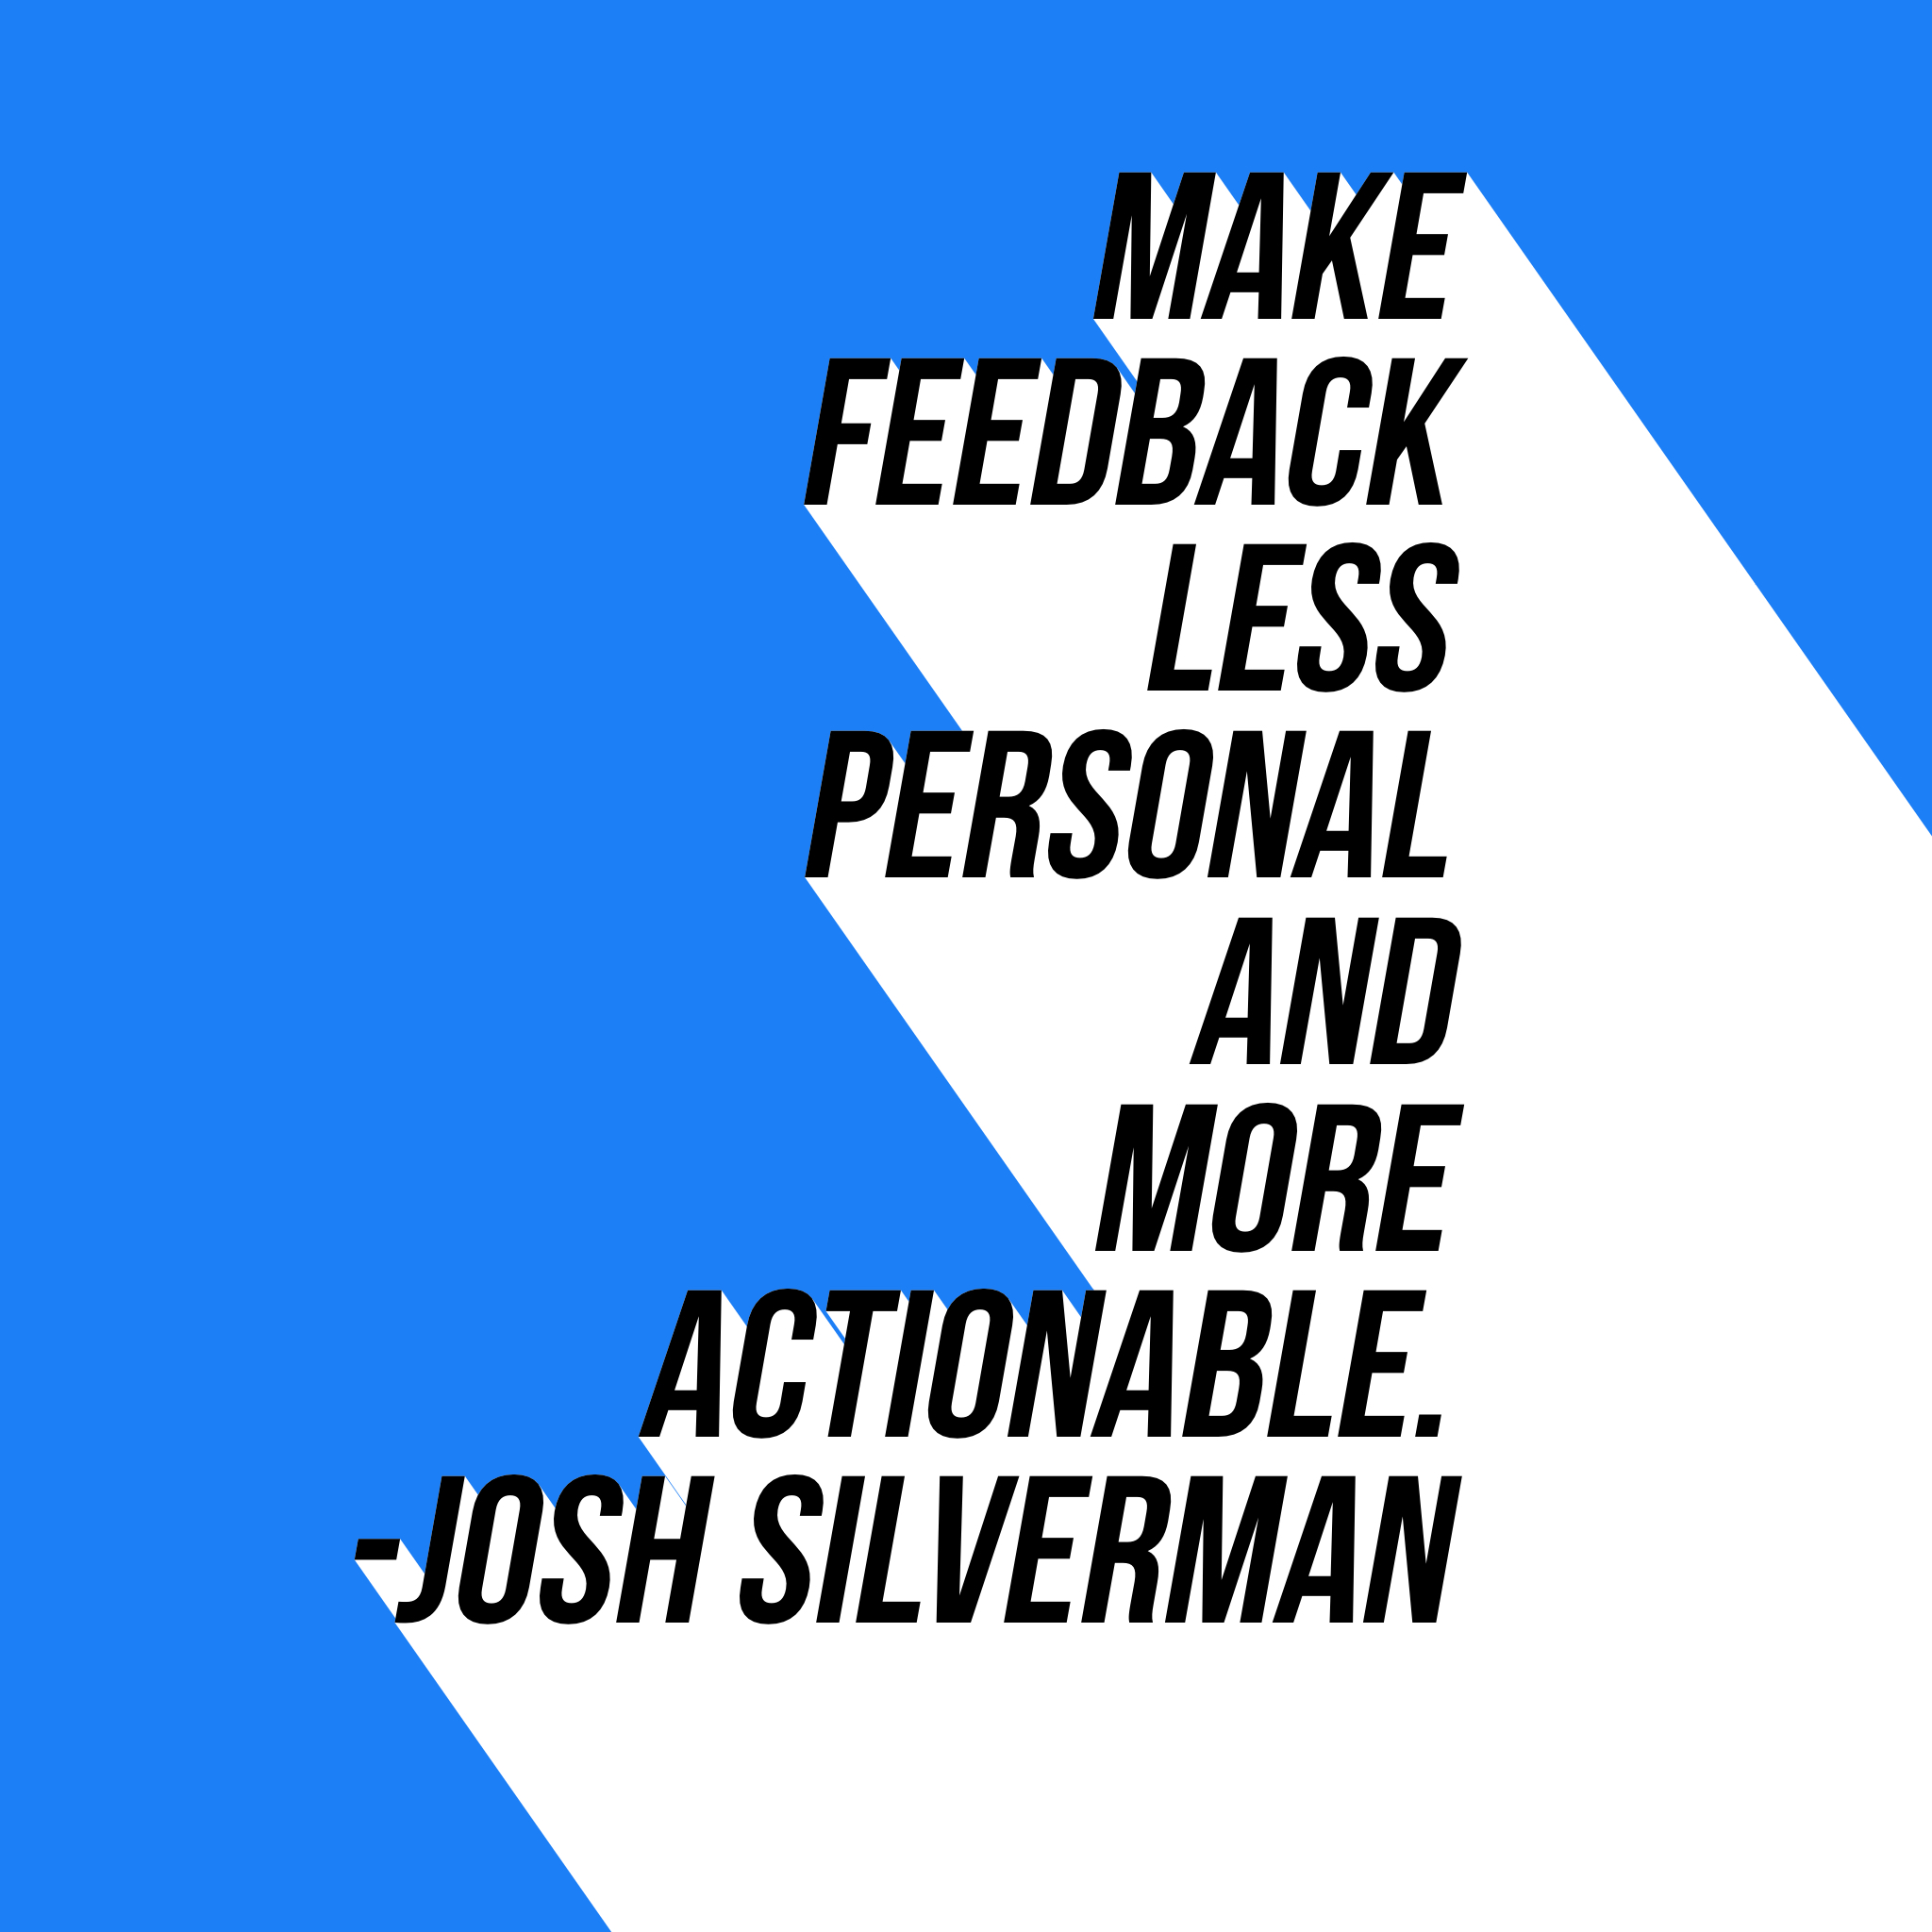 HDL-quote-JoshSilverman.jpg